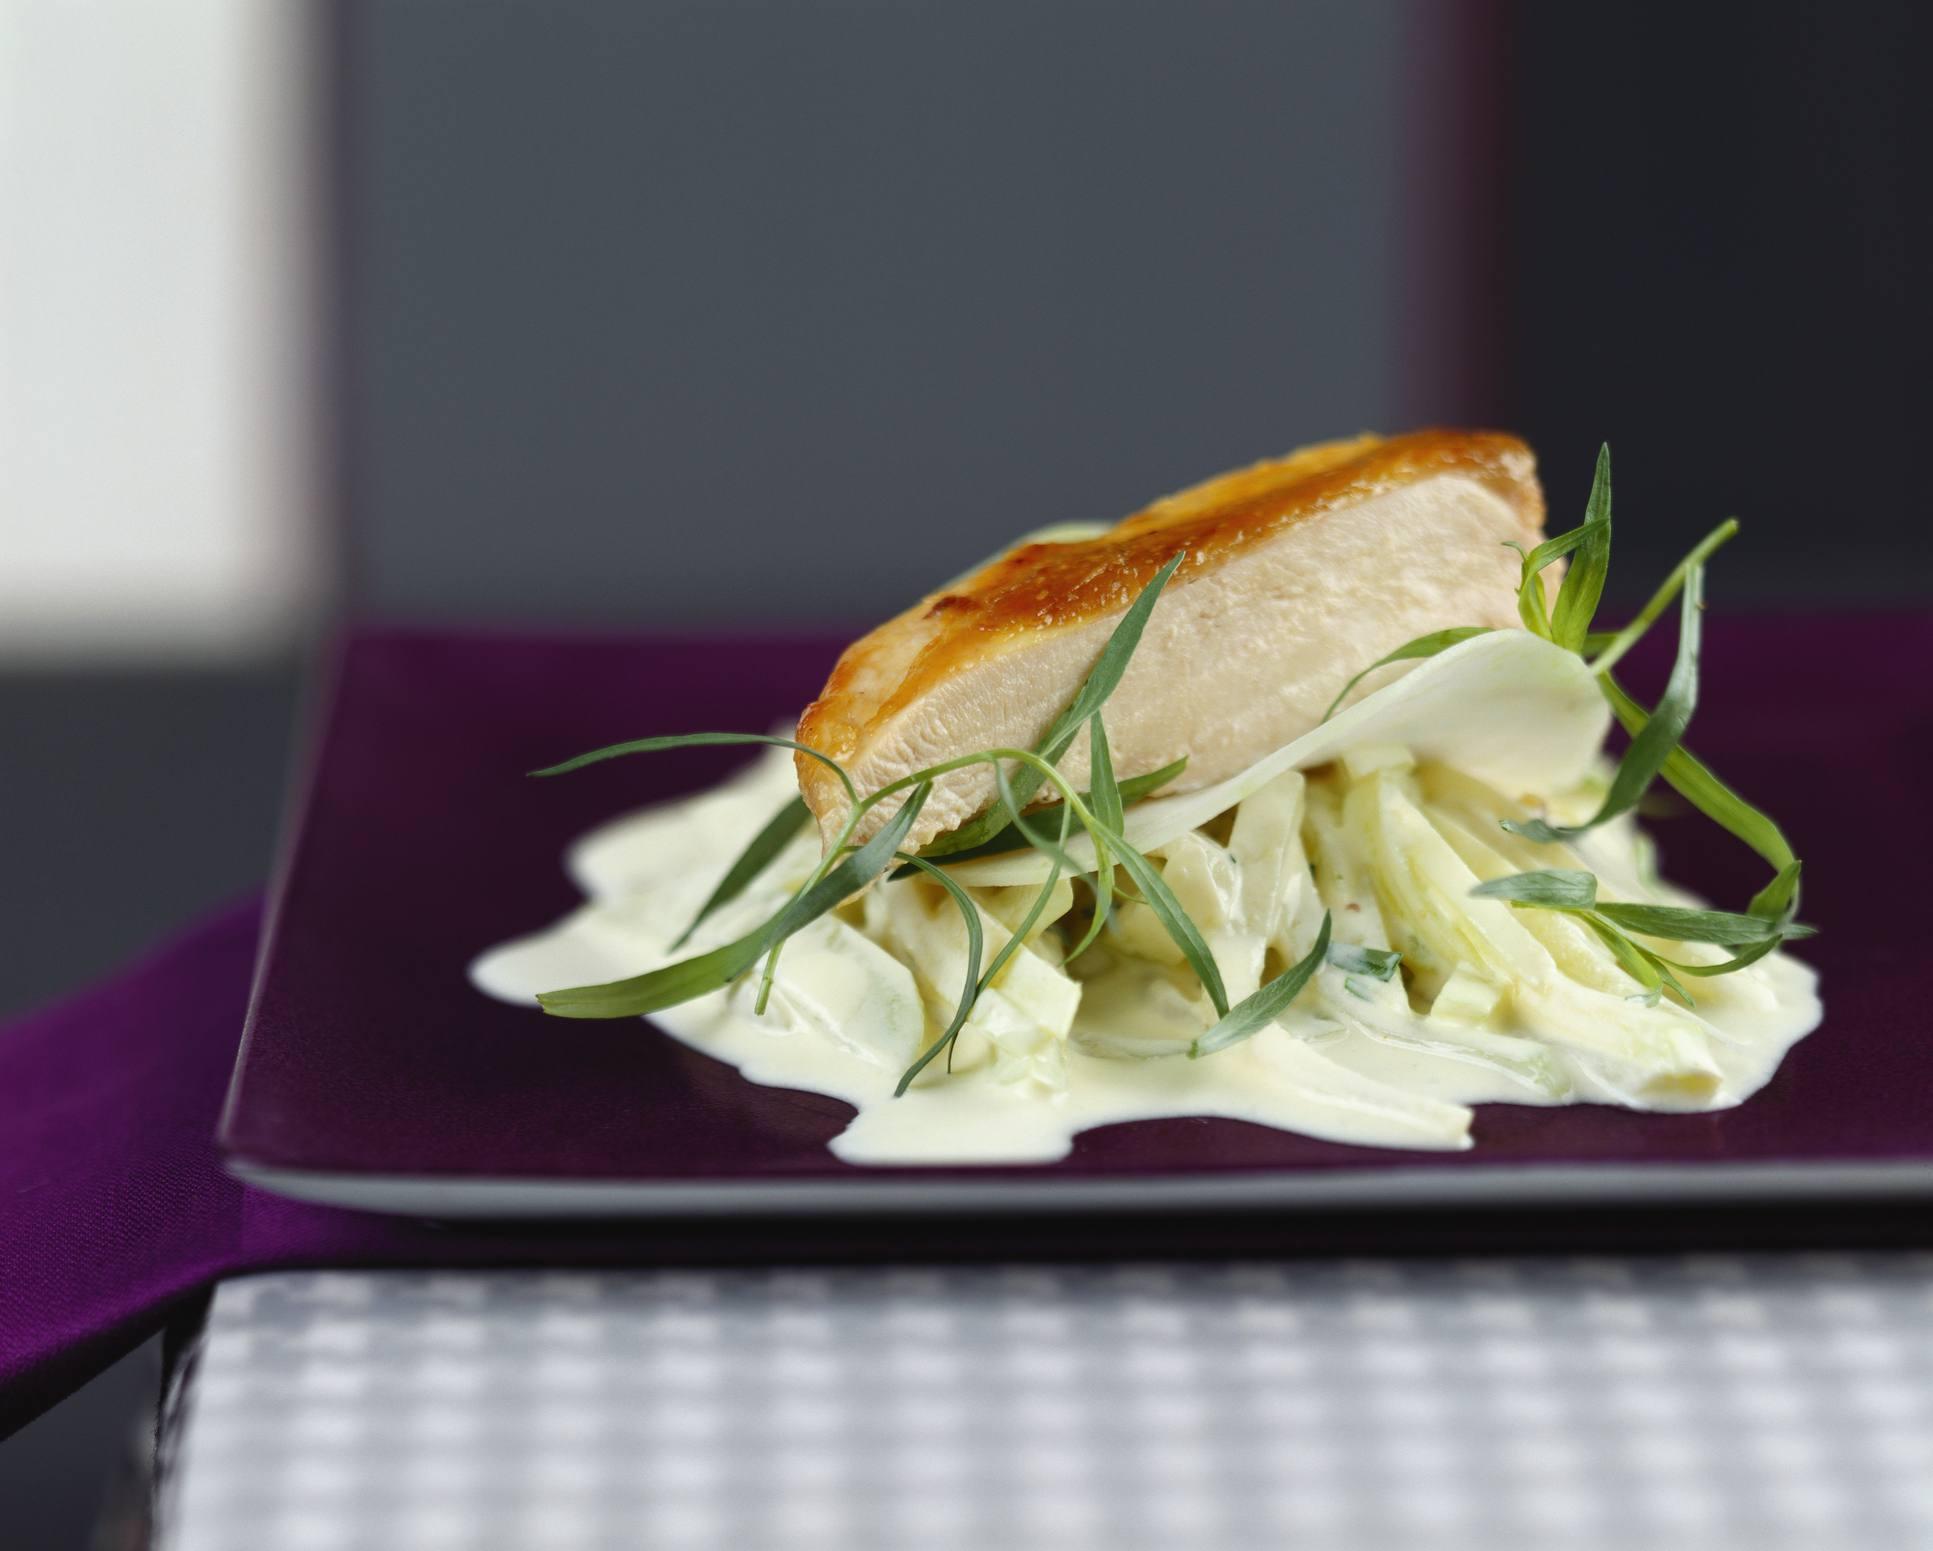 Chicken and kohlrabi side dish